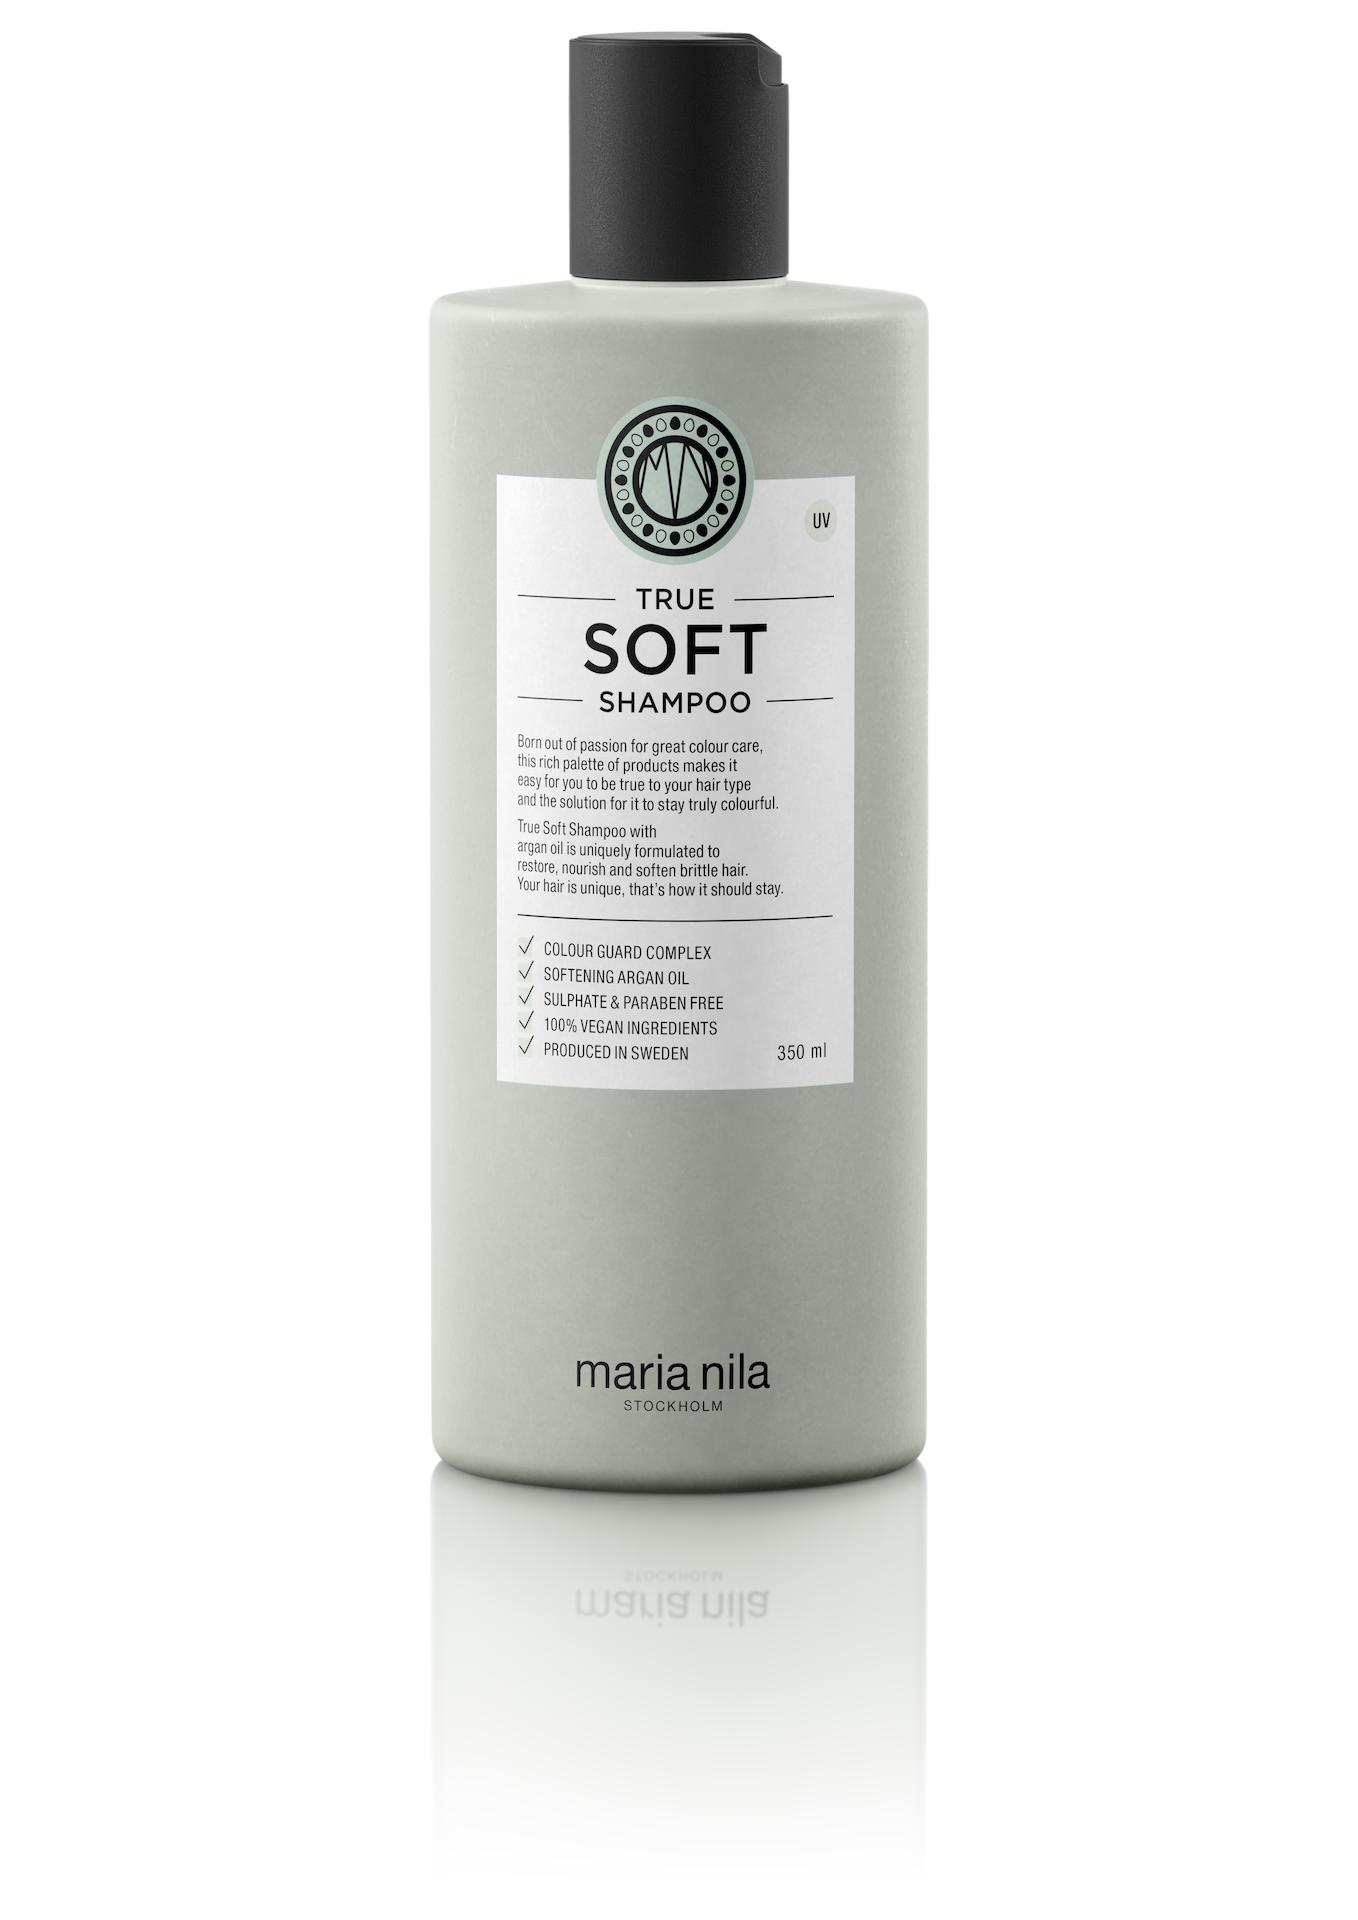 True Soft Shampoo 350ml